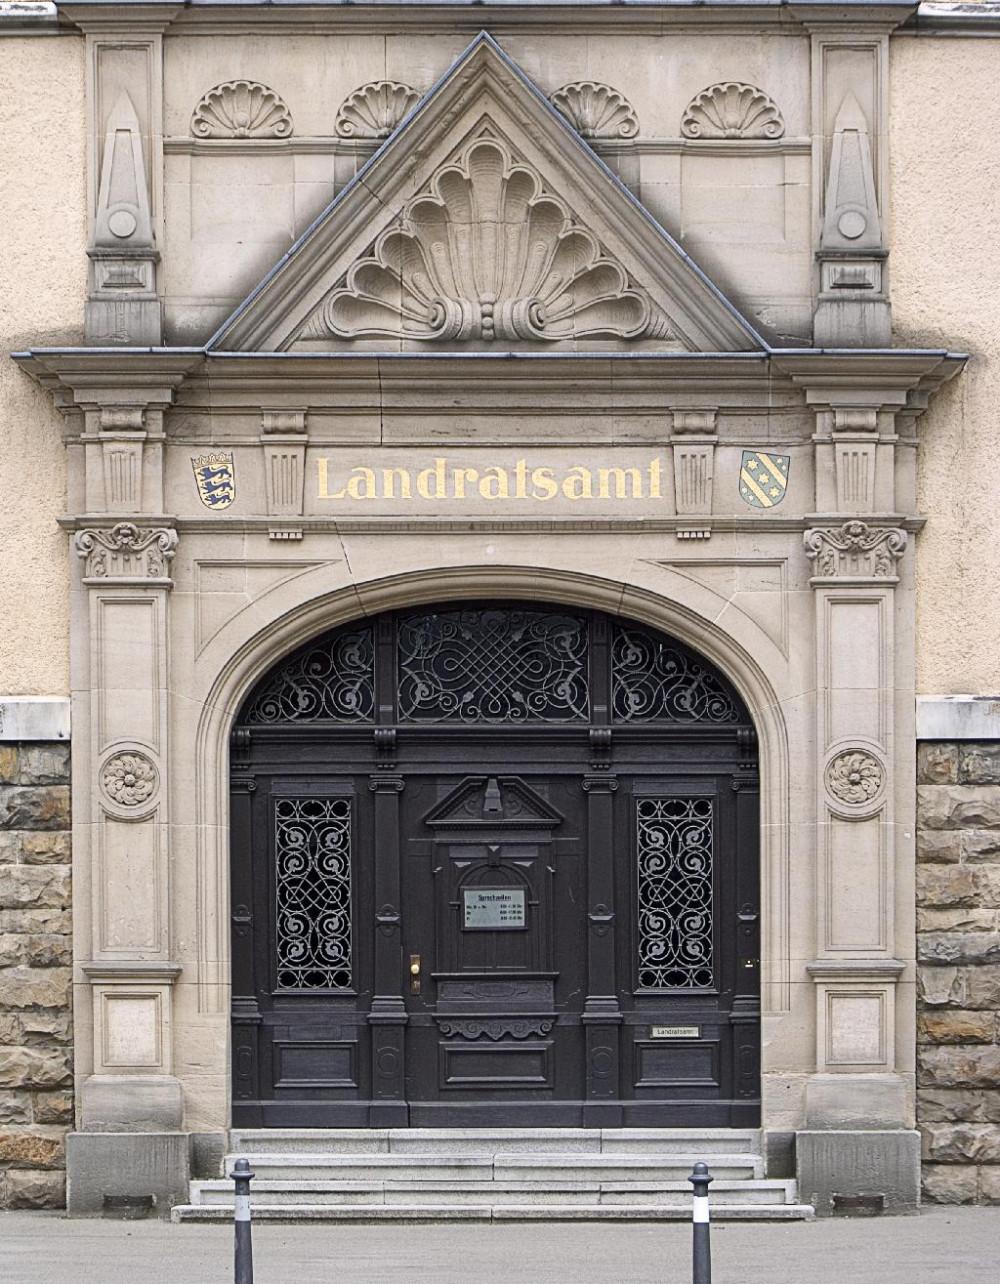 Das Hauptportal des Landratsamts Reutlingen